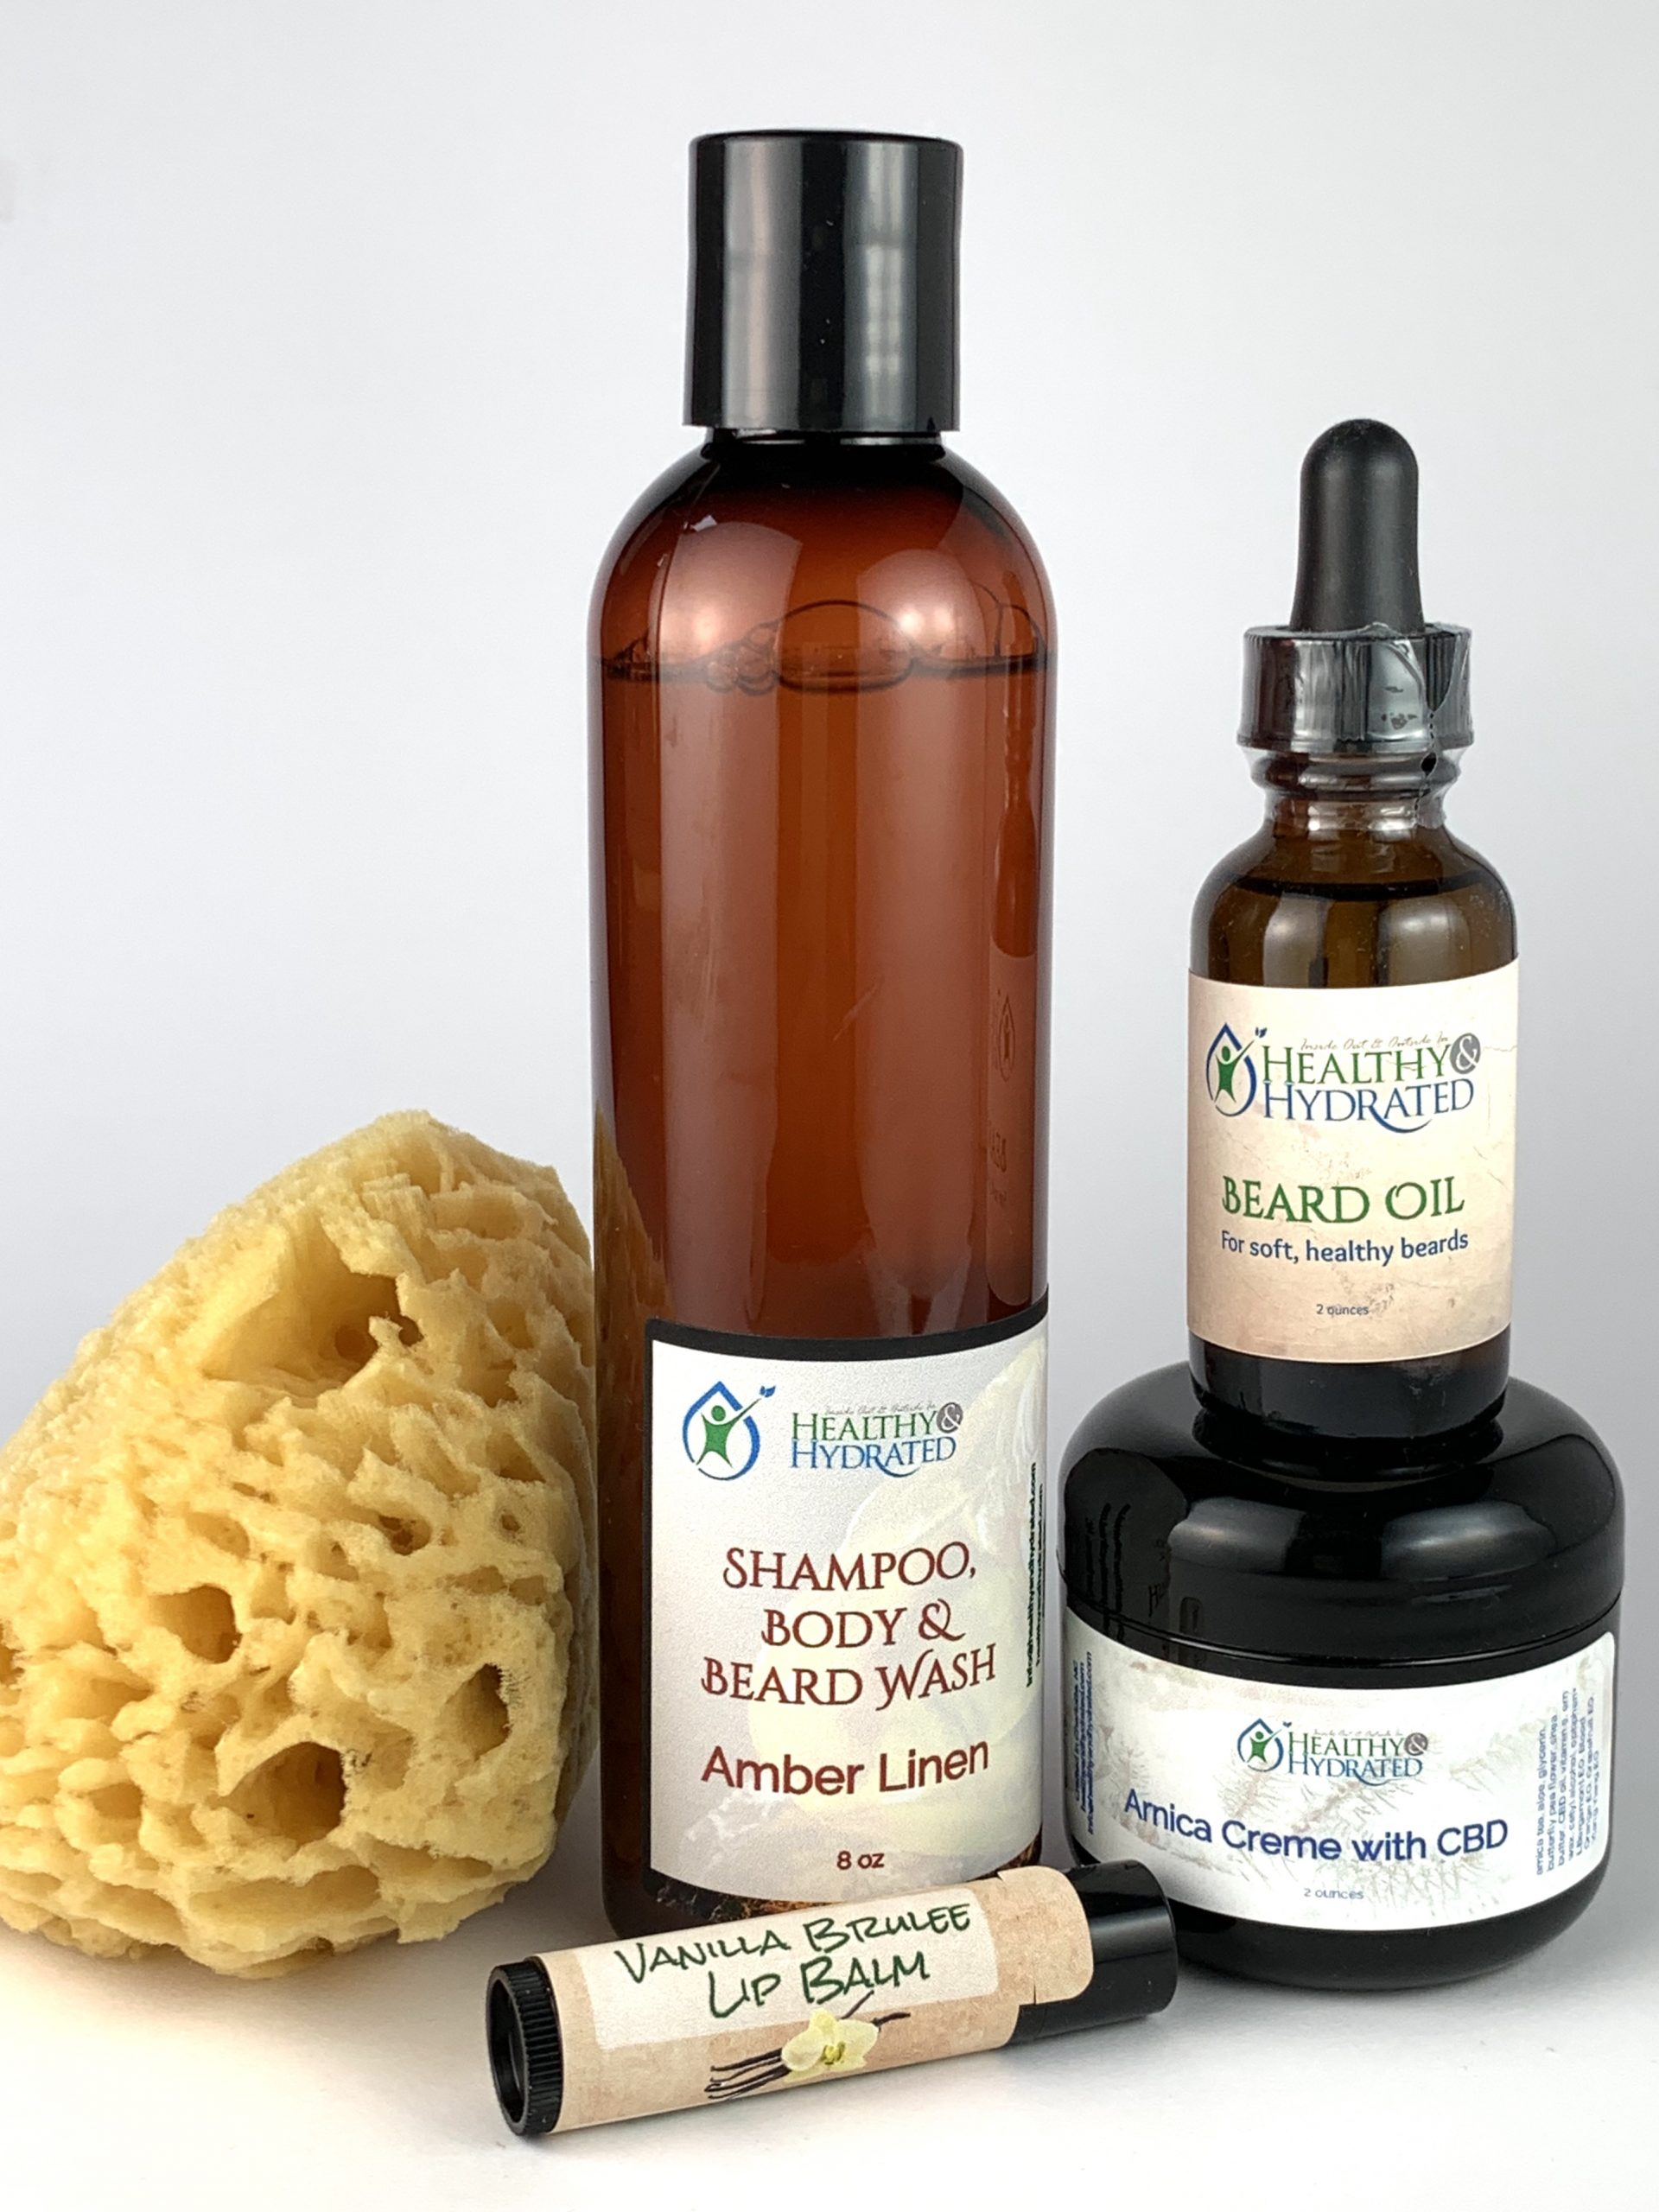 Shampoo beard and body wash